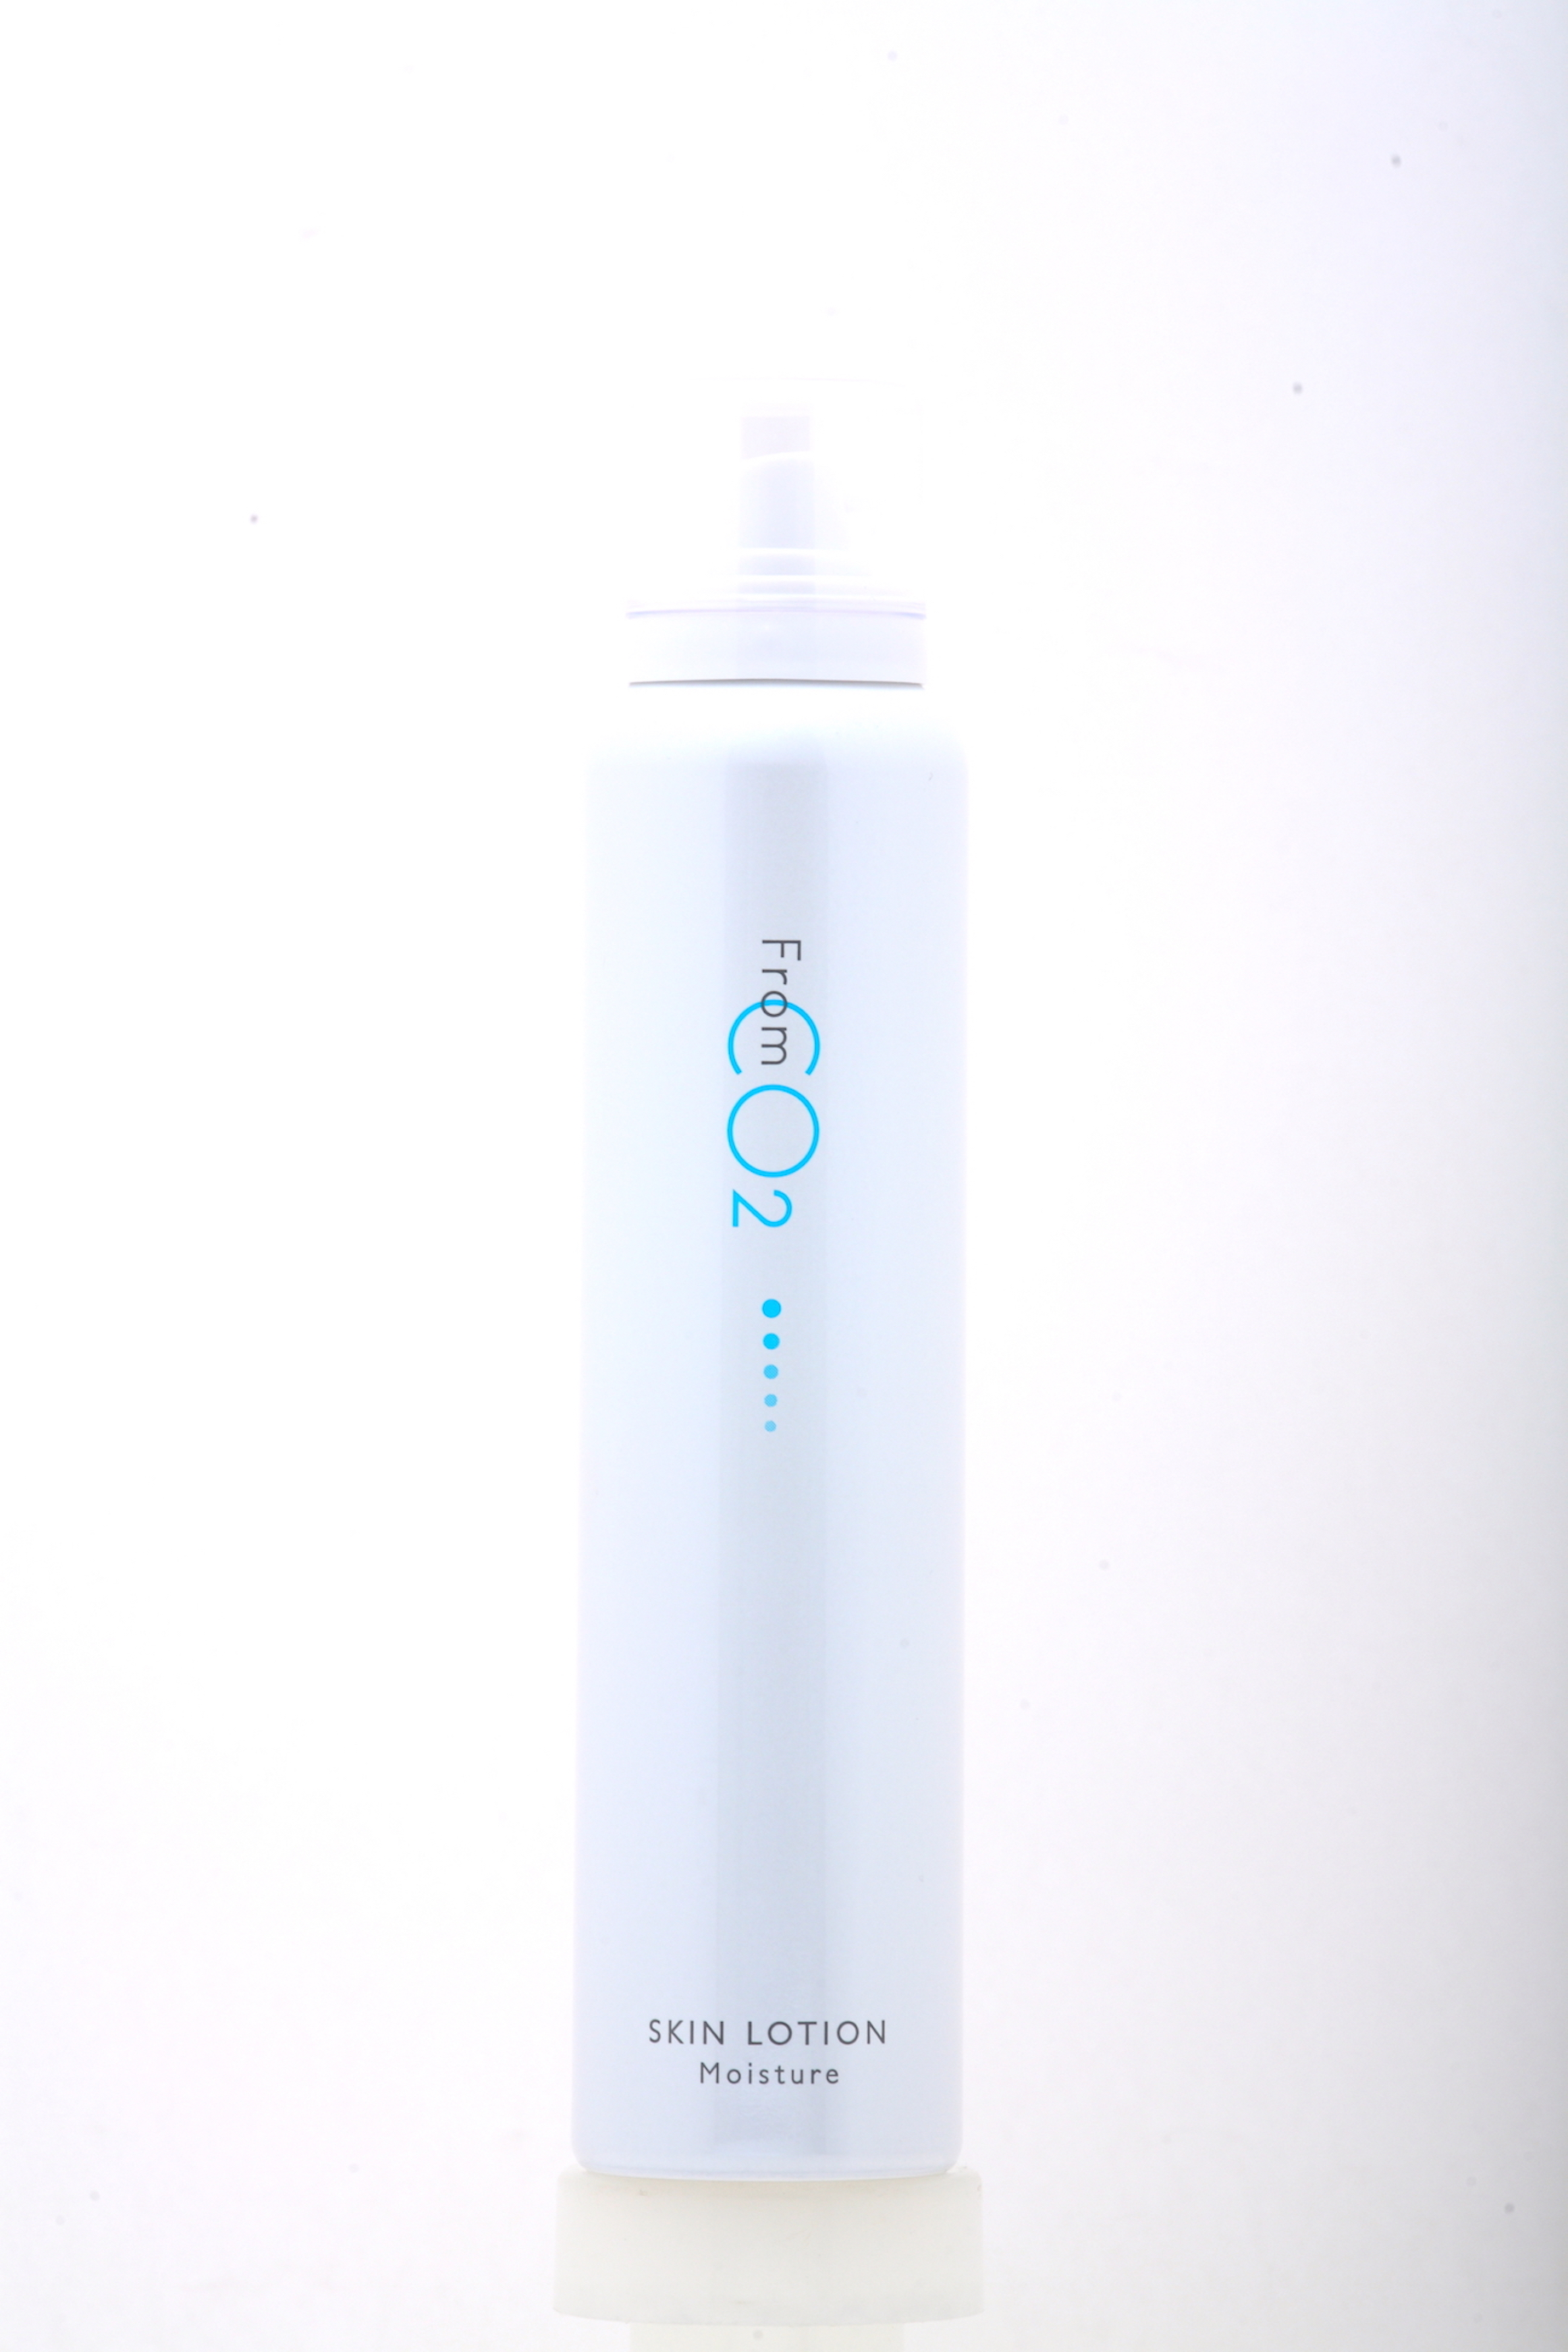 From CO2+ スキンローション(モイスチャー)